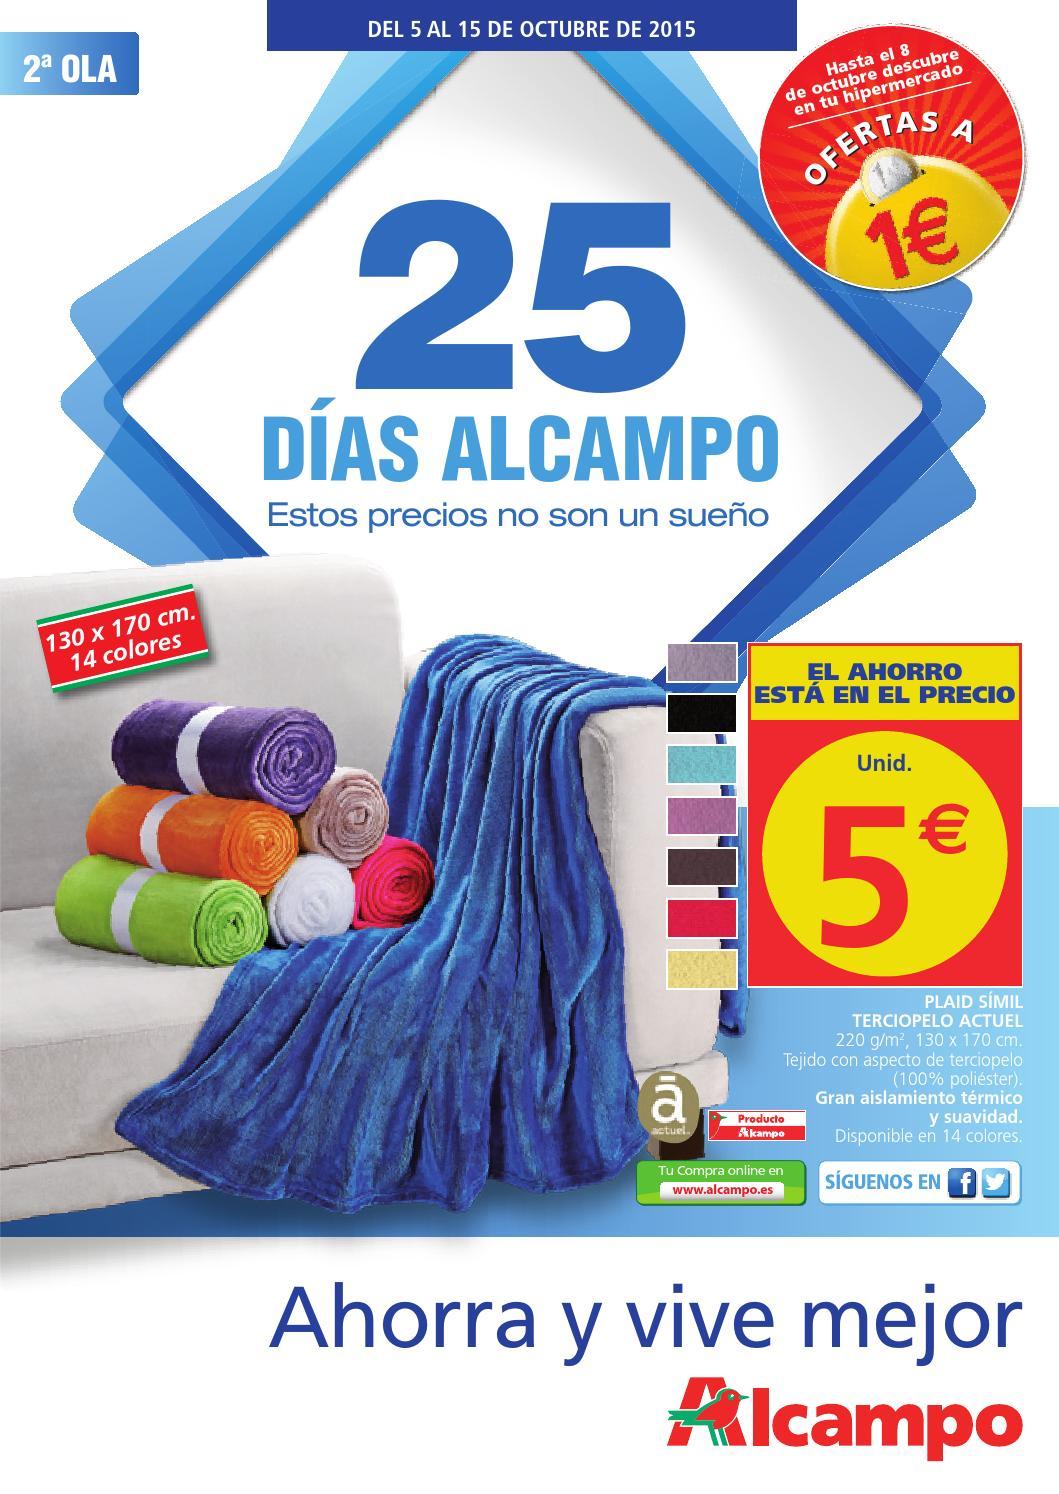 Alcampo Catalogo 17 26octubre2014 By Catalogopromociones Com Issuu ~ Pinzas Sujeta Sabanas Carrefour